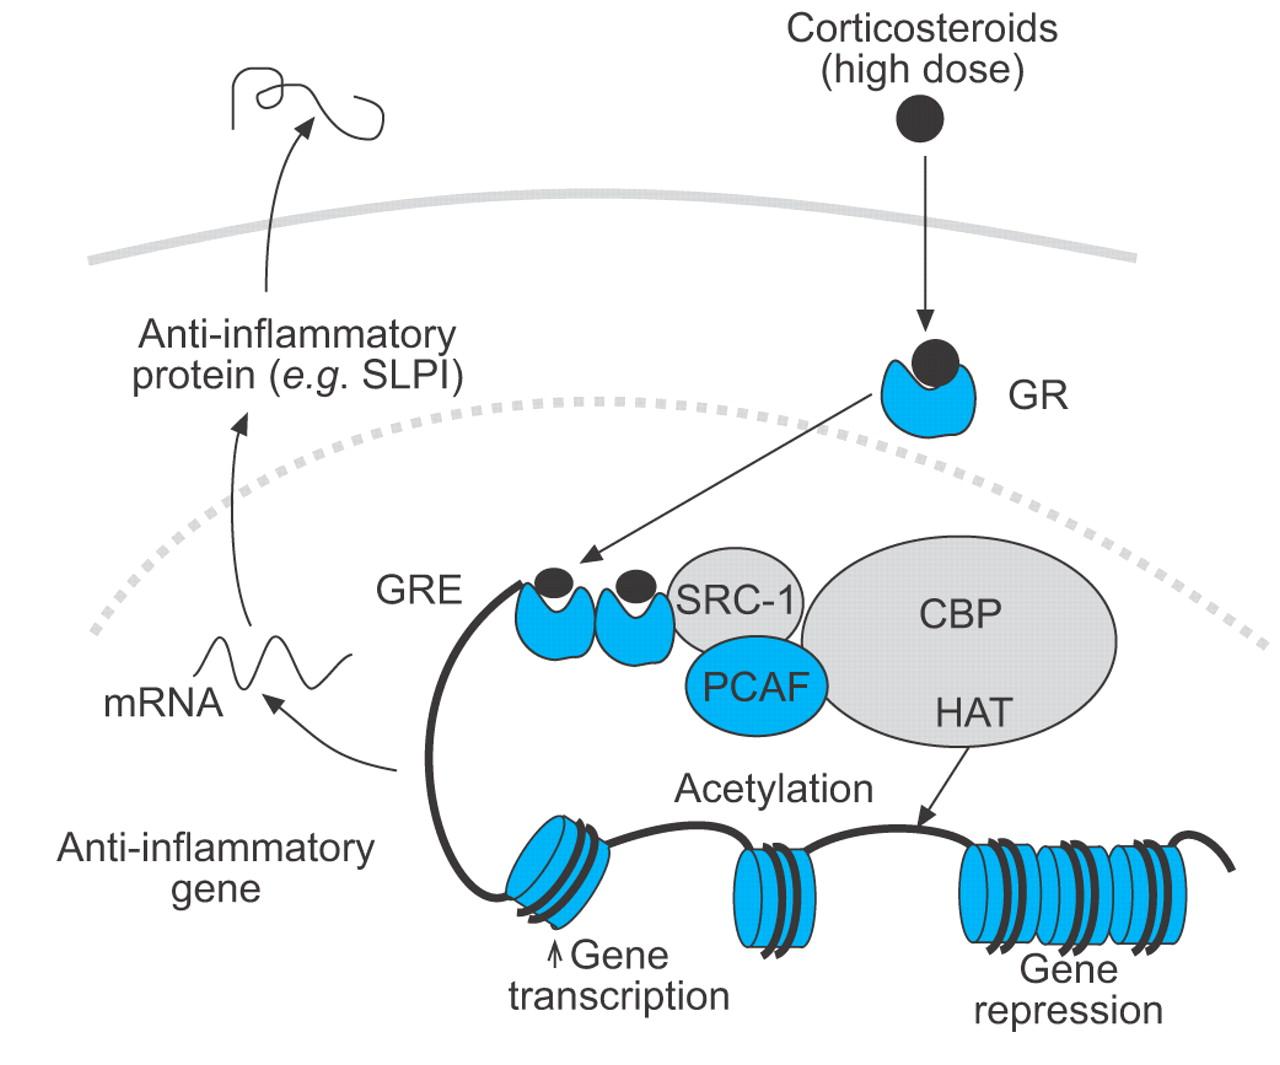 cbp a transcriptional coactivator and acetyltransferase